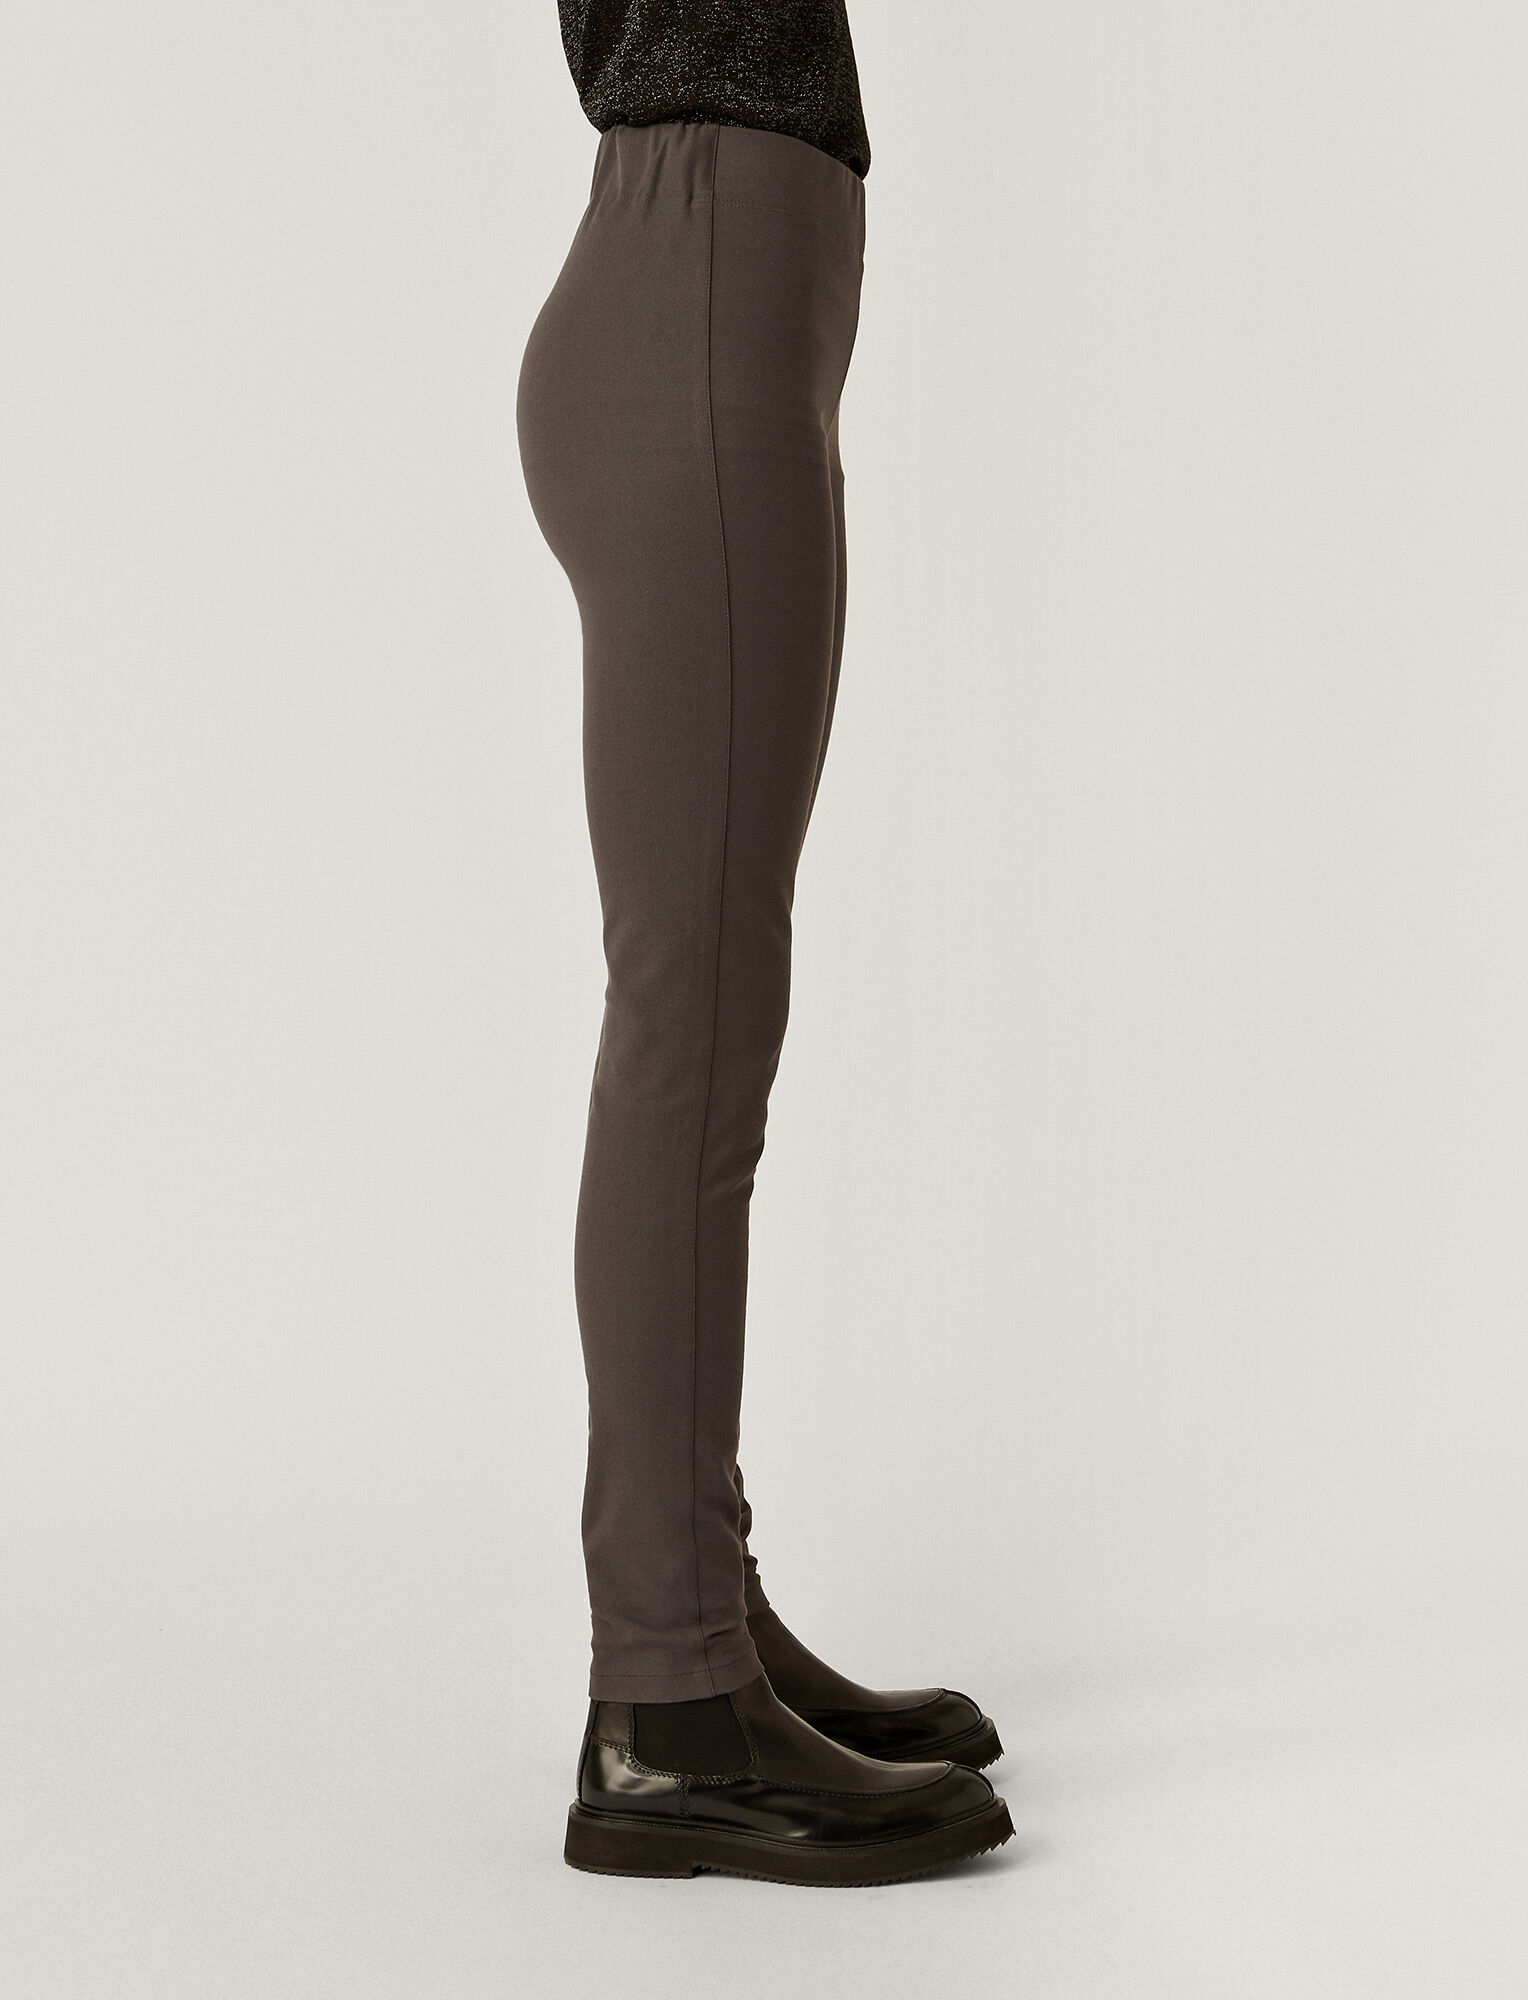 Joseph, Gabardine Stretch Leggings, in CAPERS